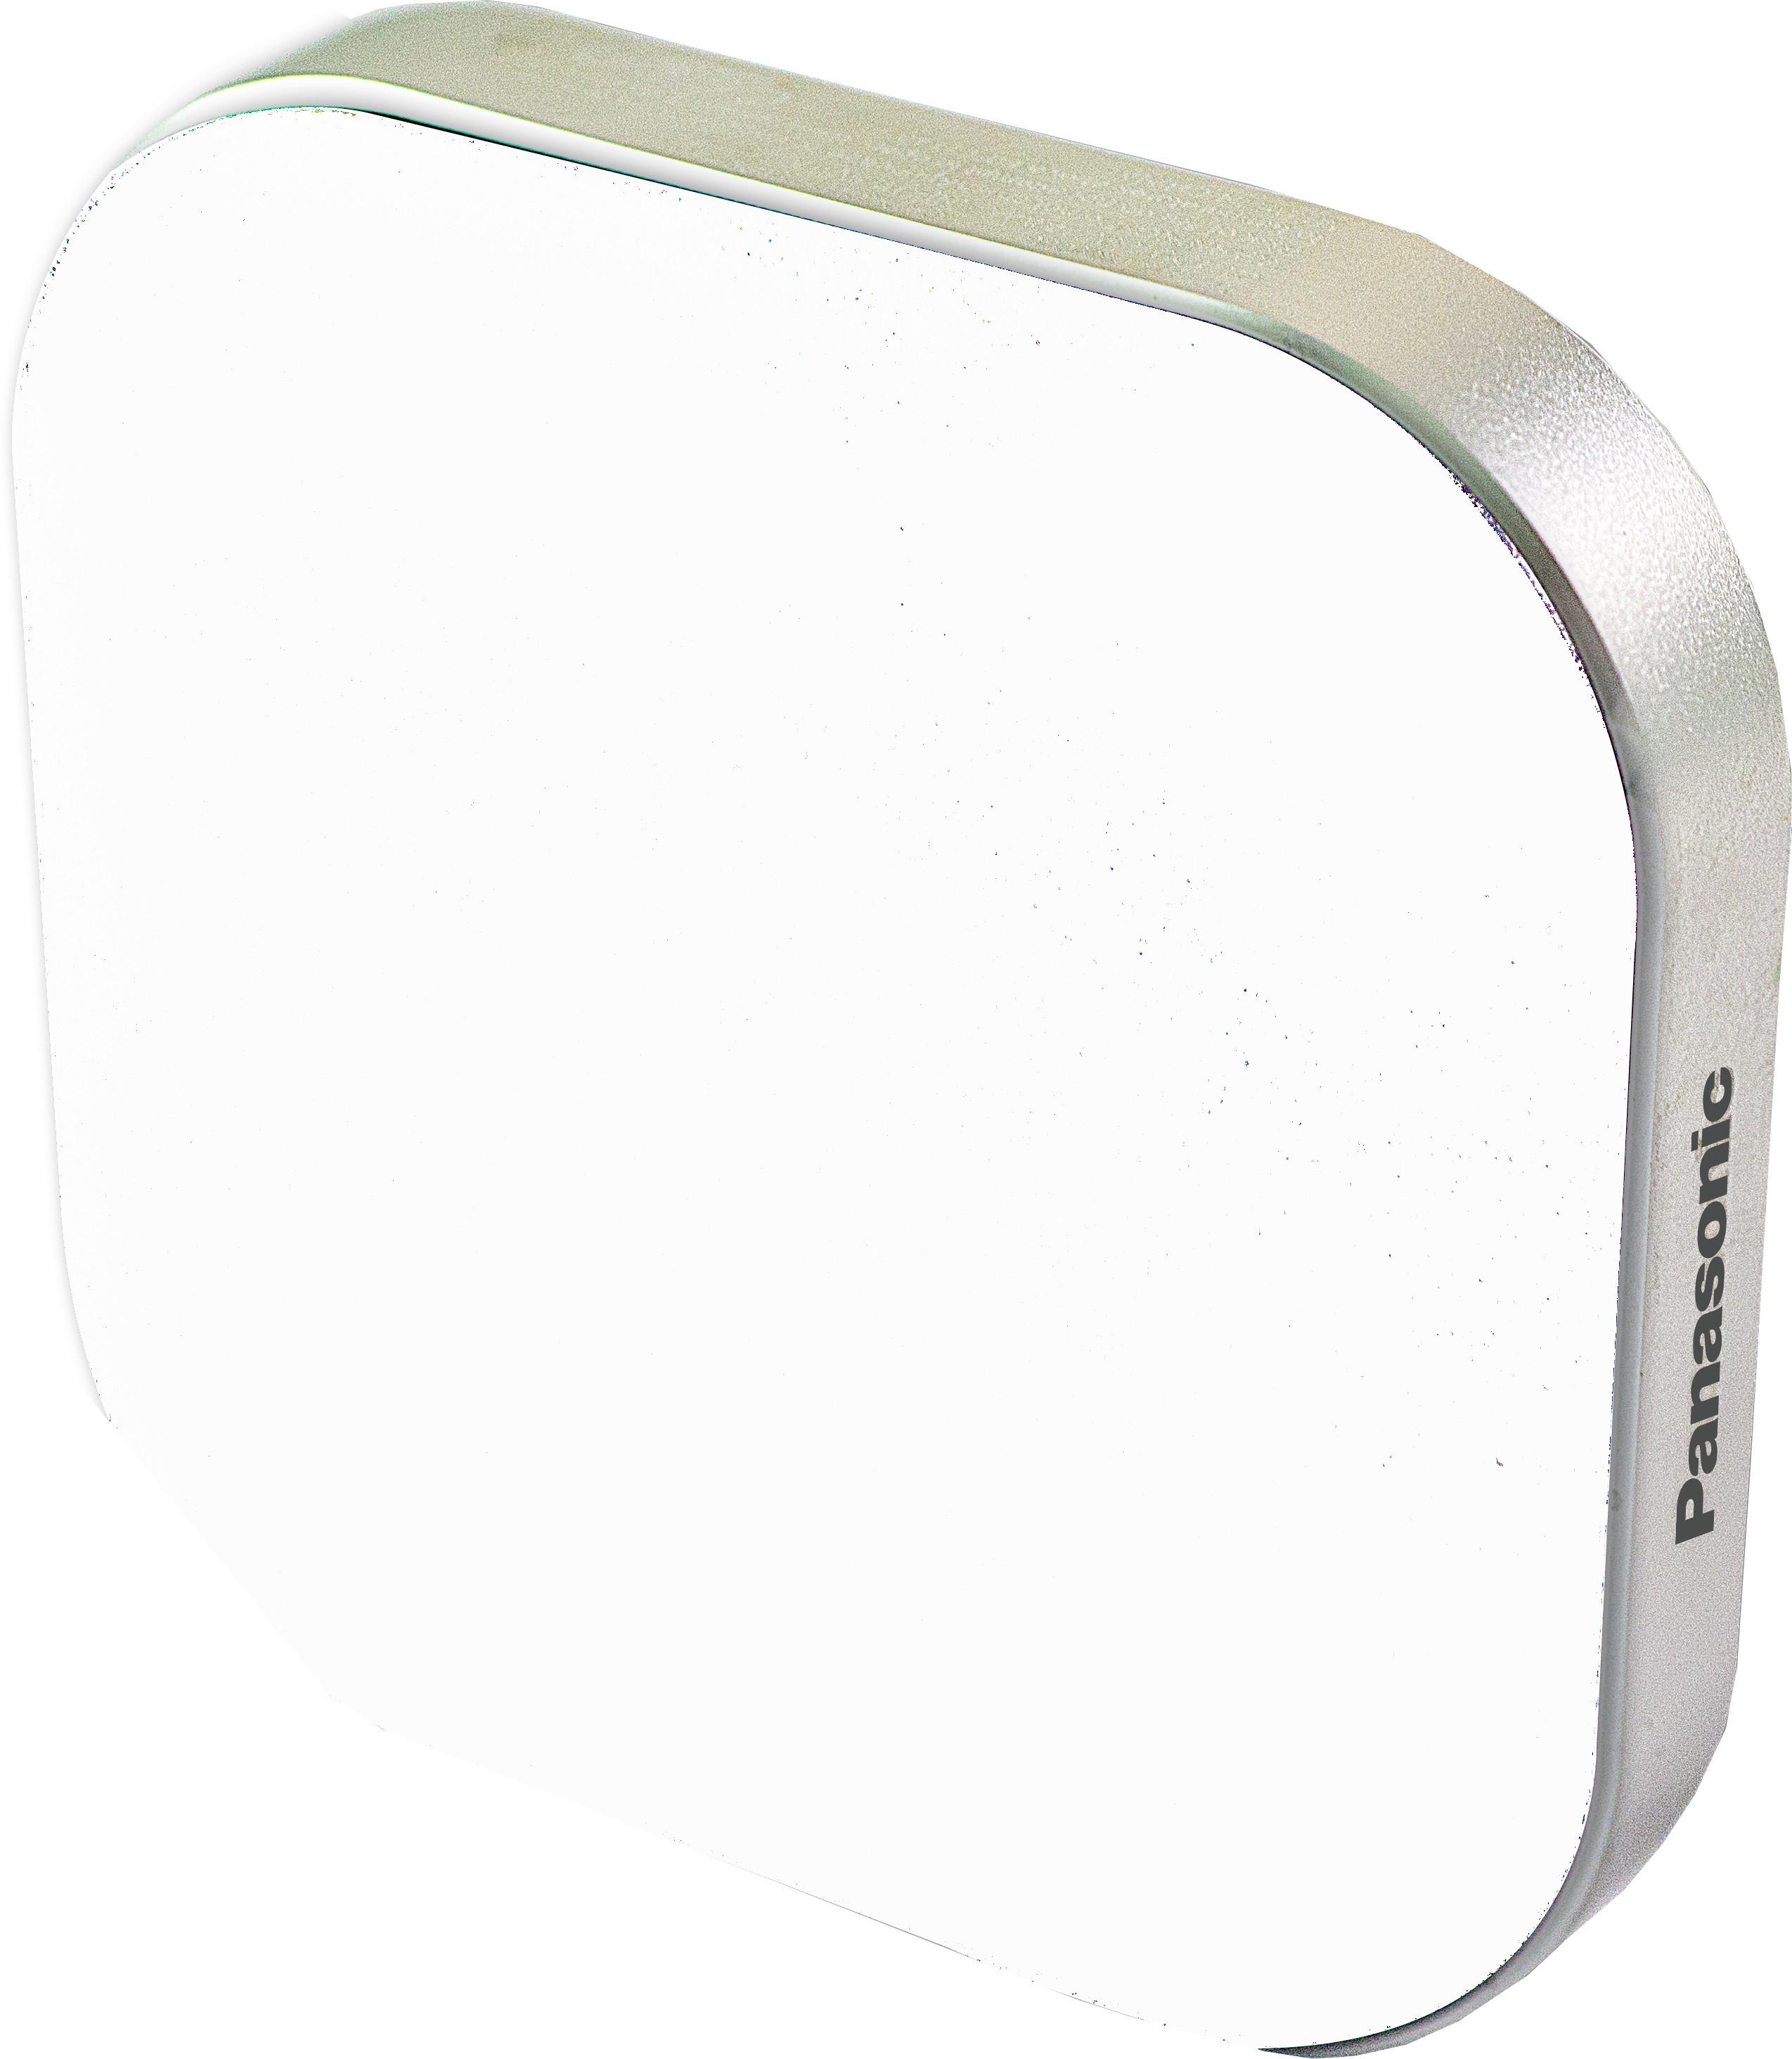 Deals - Thane - Panasonic <br> Power Banks 9000 mAh<br> Category - mobiles_and_accessories<br> Business - Flipkart.com